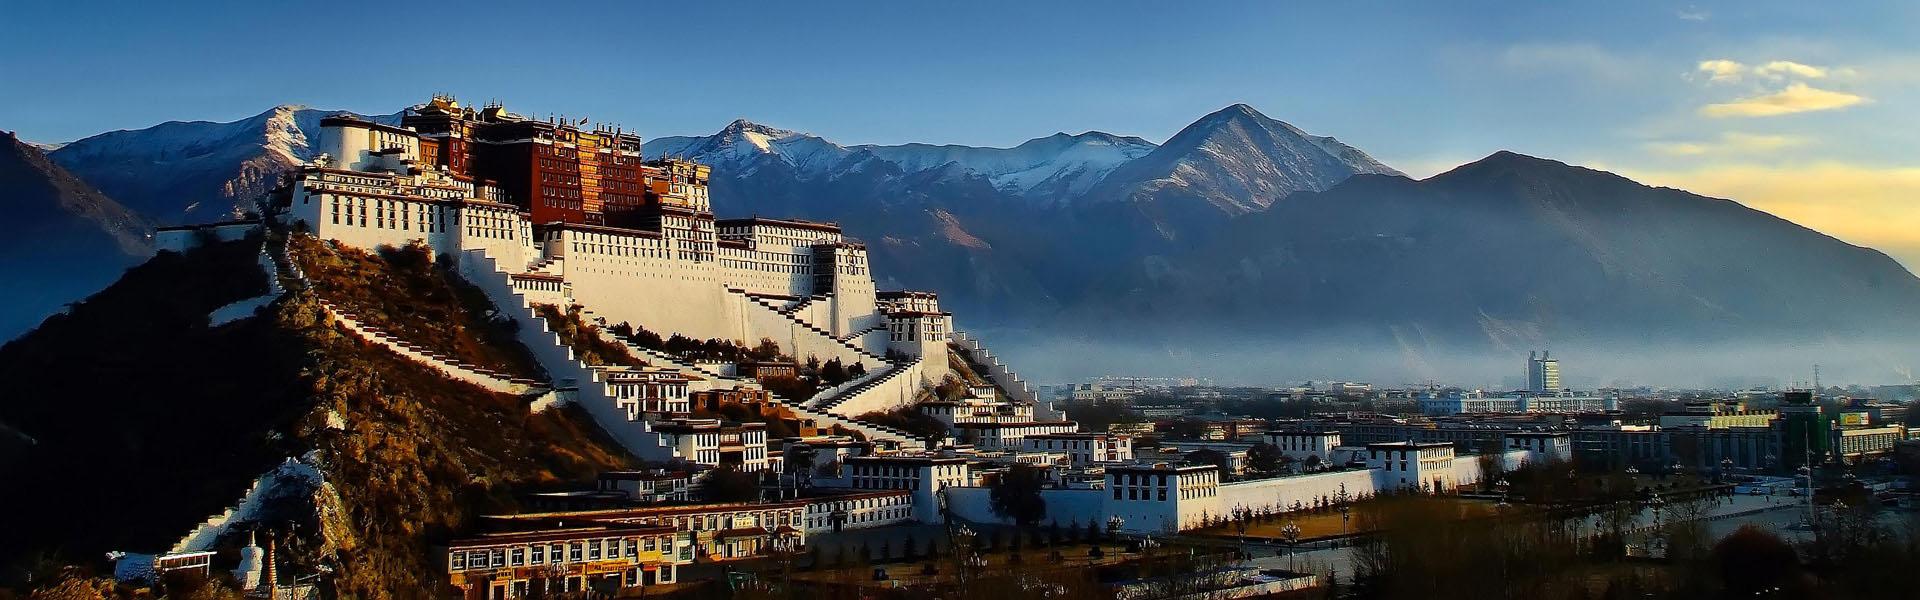 Lhasa, the capitabl of mysterious Tibet